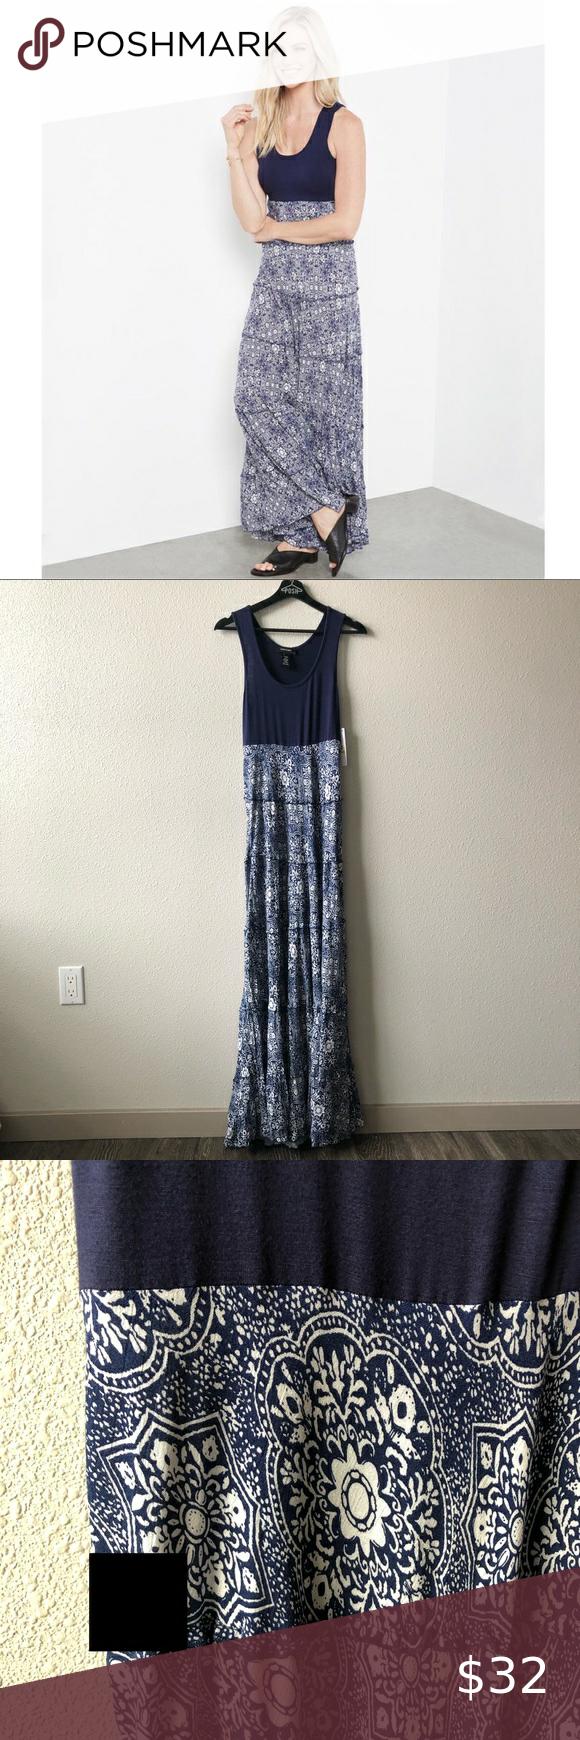 Karen Kane Contrast Fabric Sleeveless Maxi Dress In 2020 Sleeveless Maxi Dress Karen Kane Dress Dresses [ 1740 x 580 Pixel ]